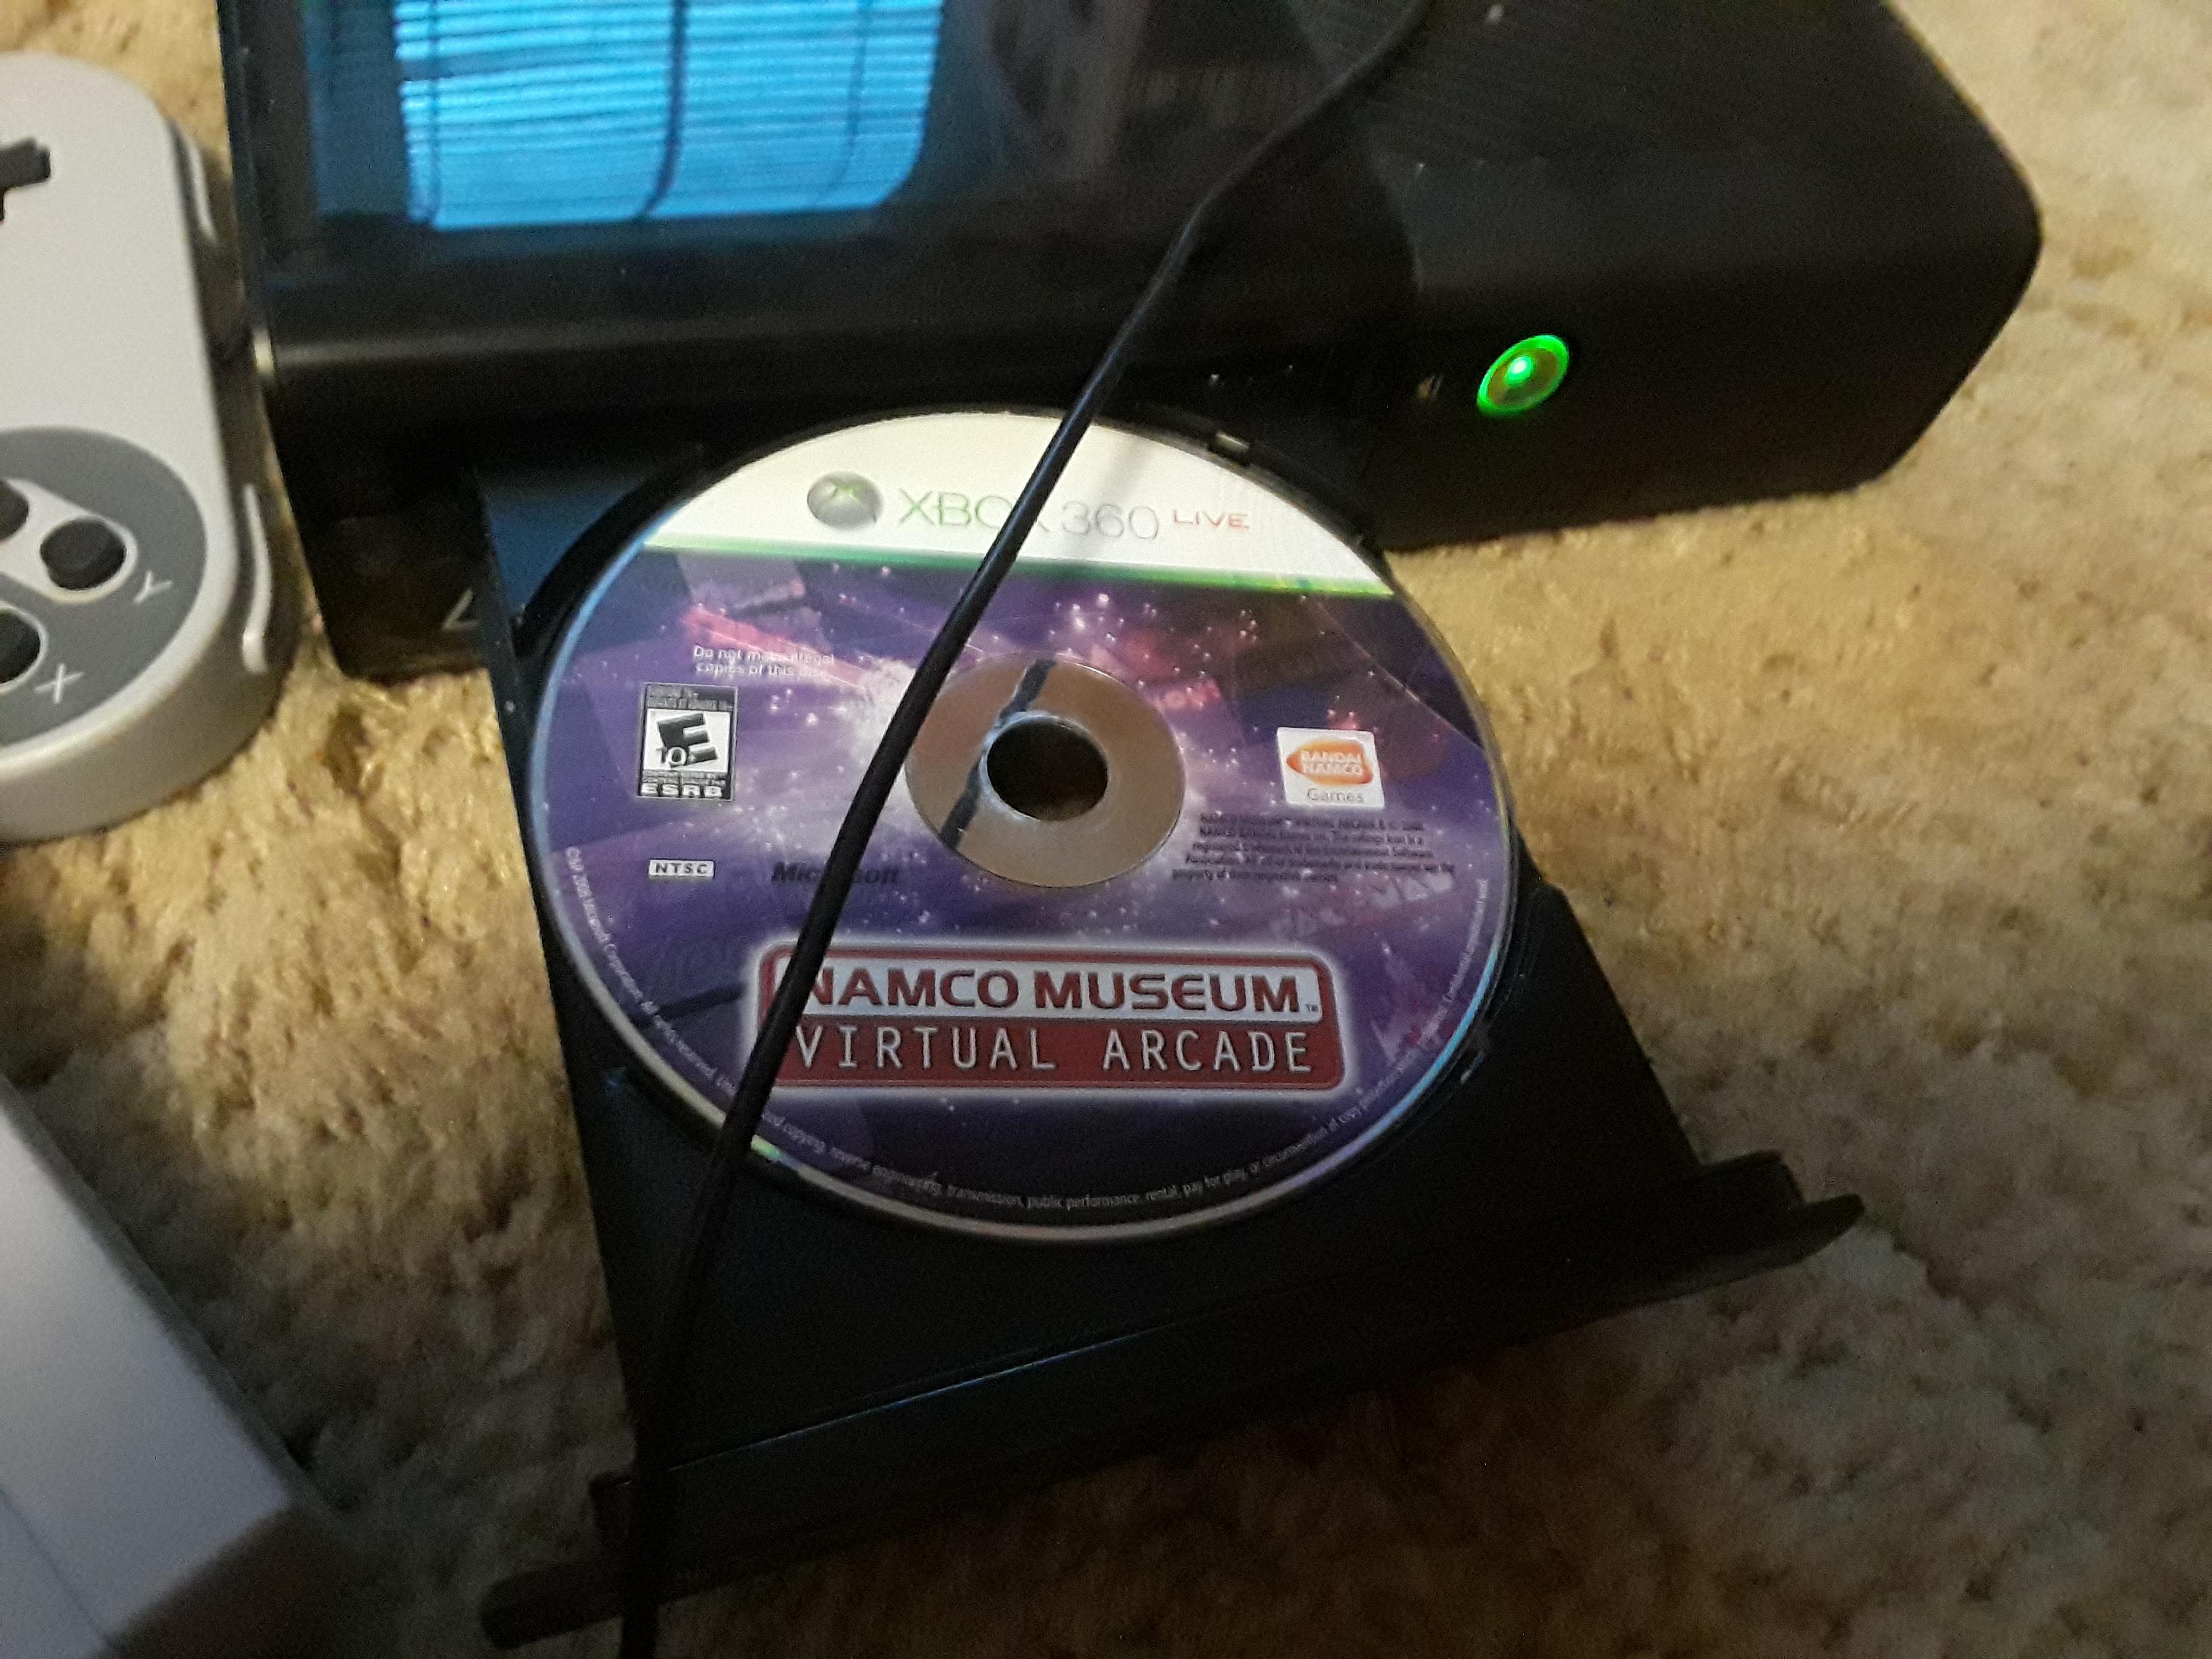 JML101582: Namco Muesum Virtual Arcade: Sky Kid Deluxe (Xbox 360) 15,020 points on 2018-11-16 17:46:41